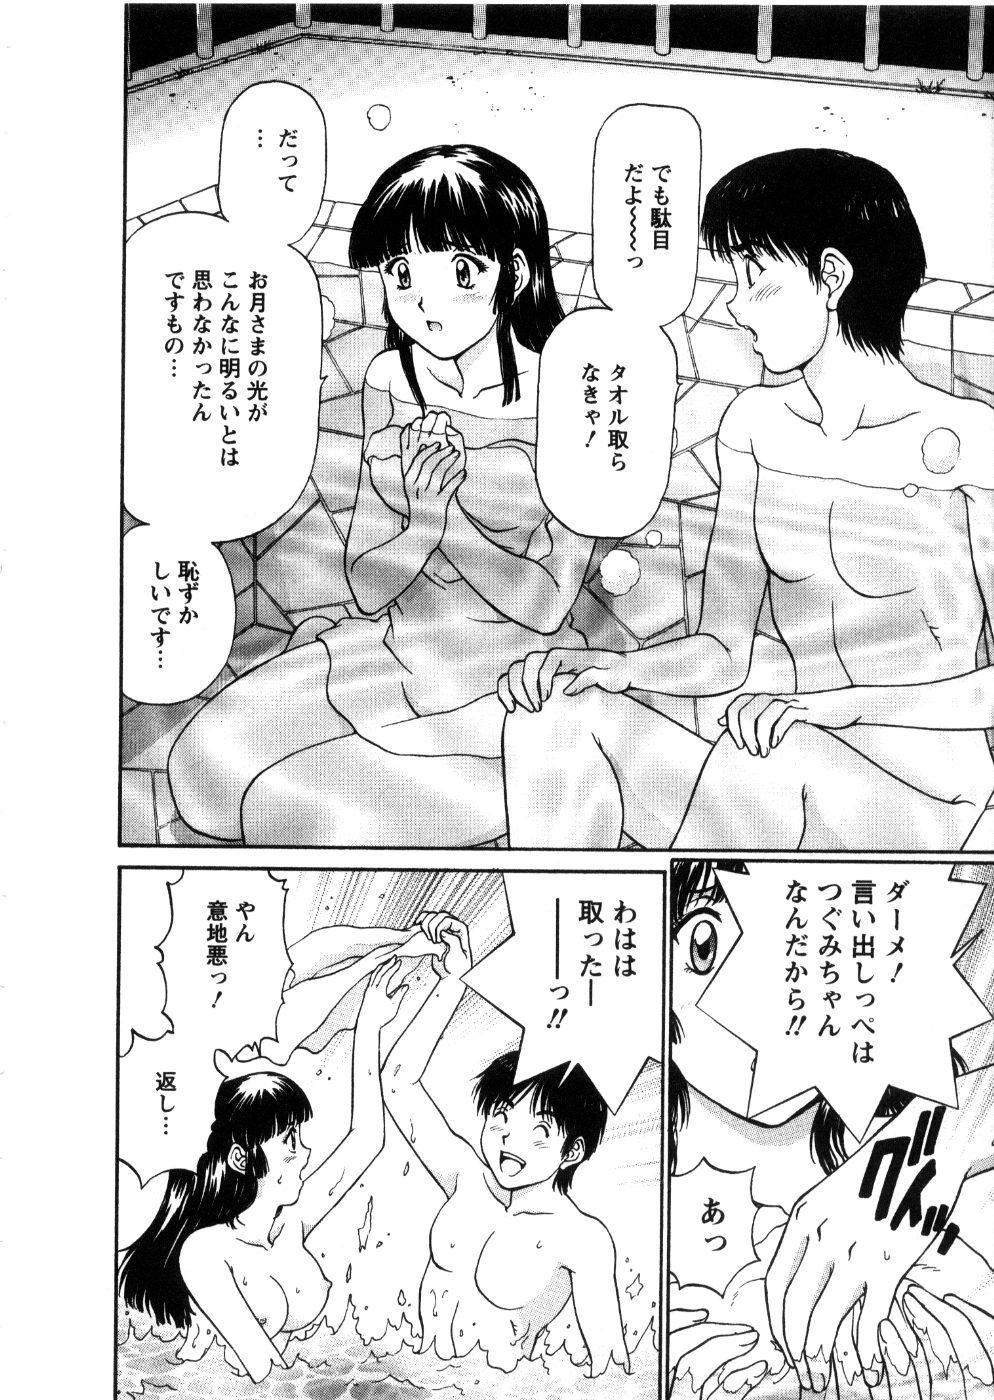 Oneechan-tachi ga Yatte Kuru 03 135